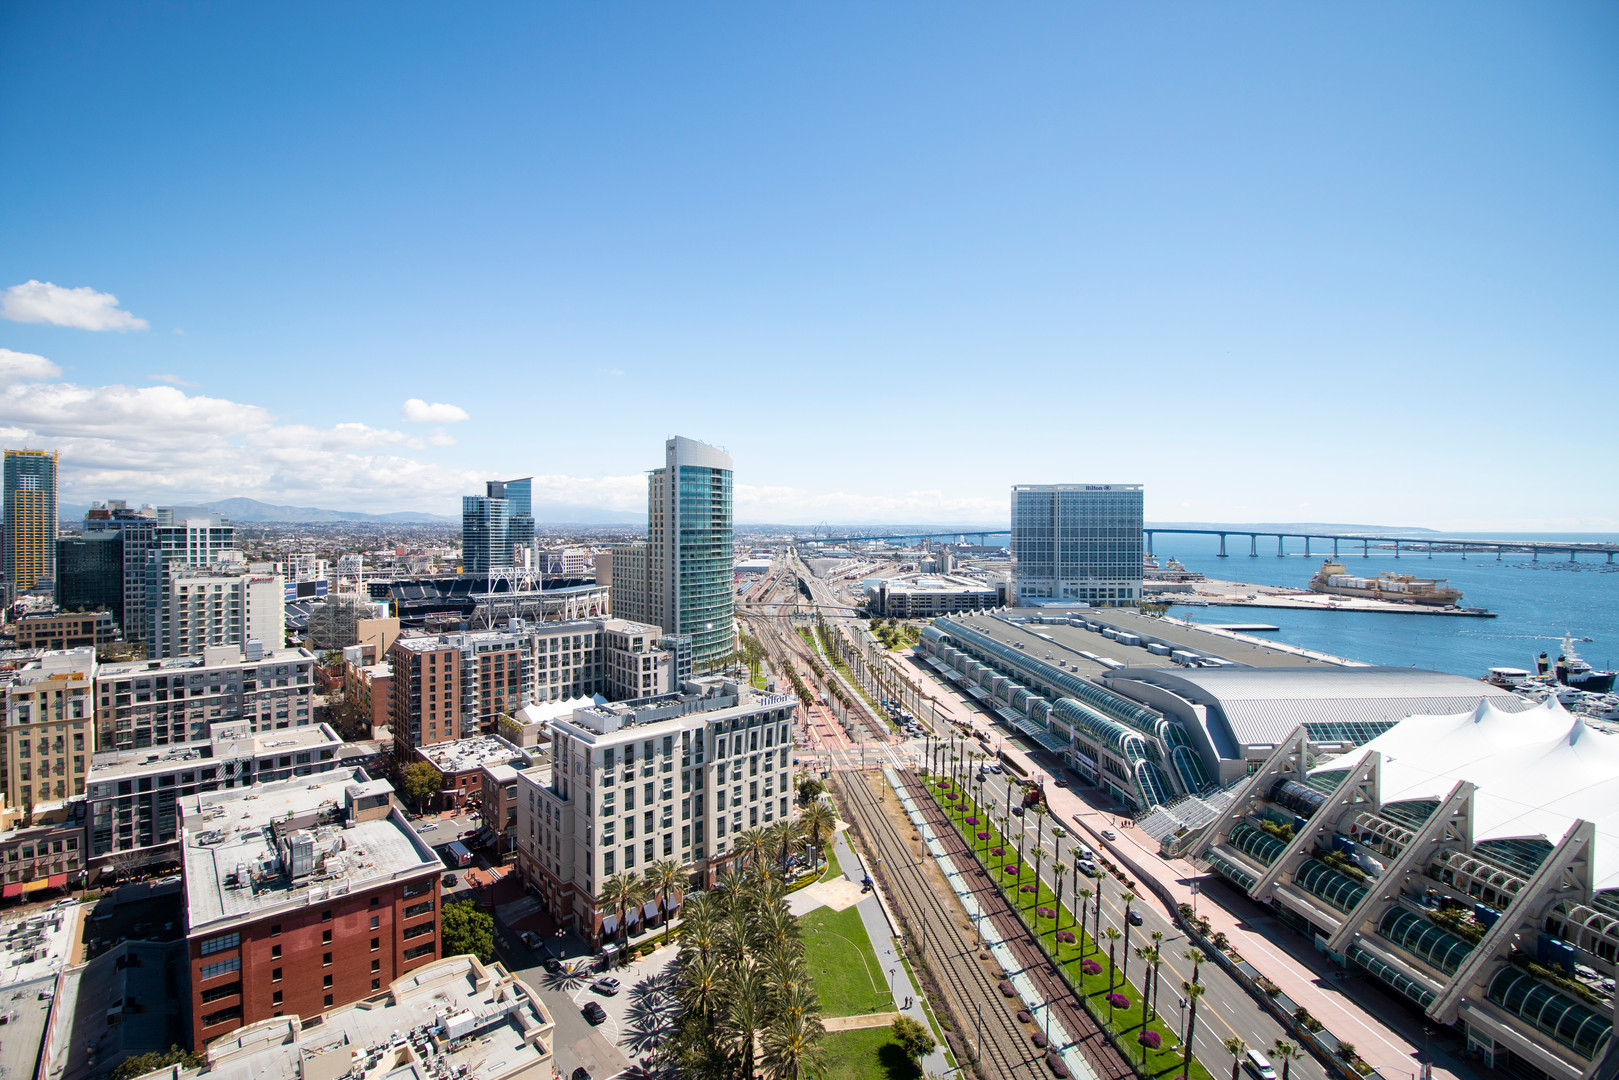 San Diego Convention Center, Petco Park, Gaslamp, Coronado Bridge View